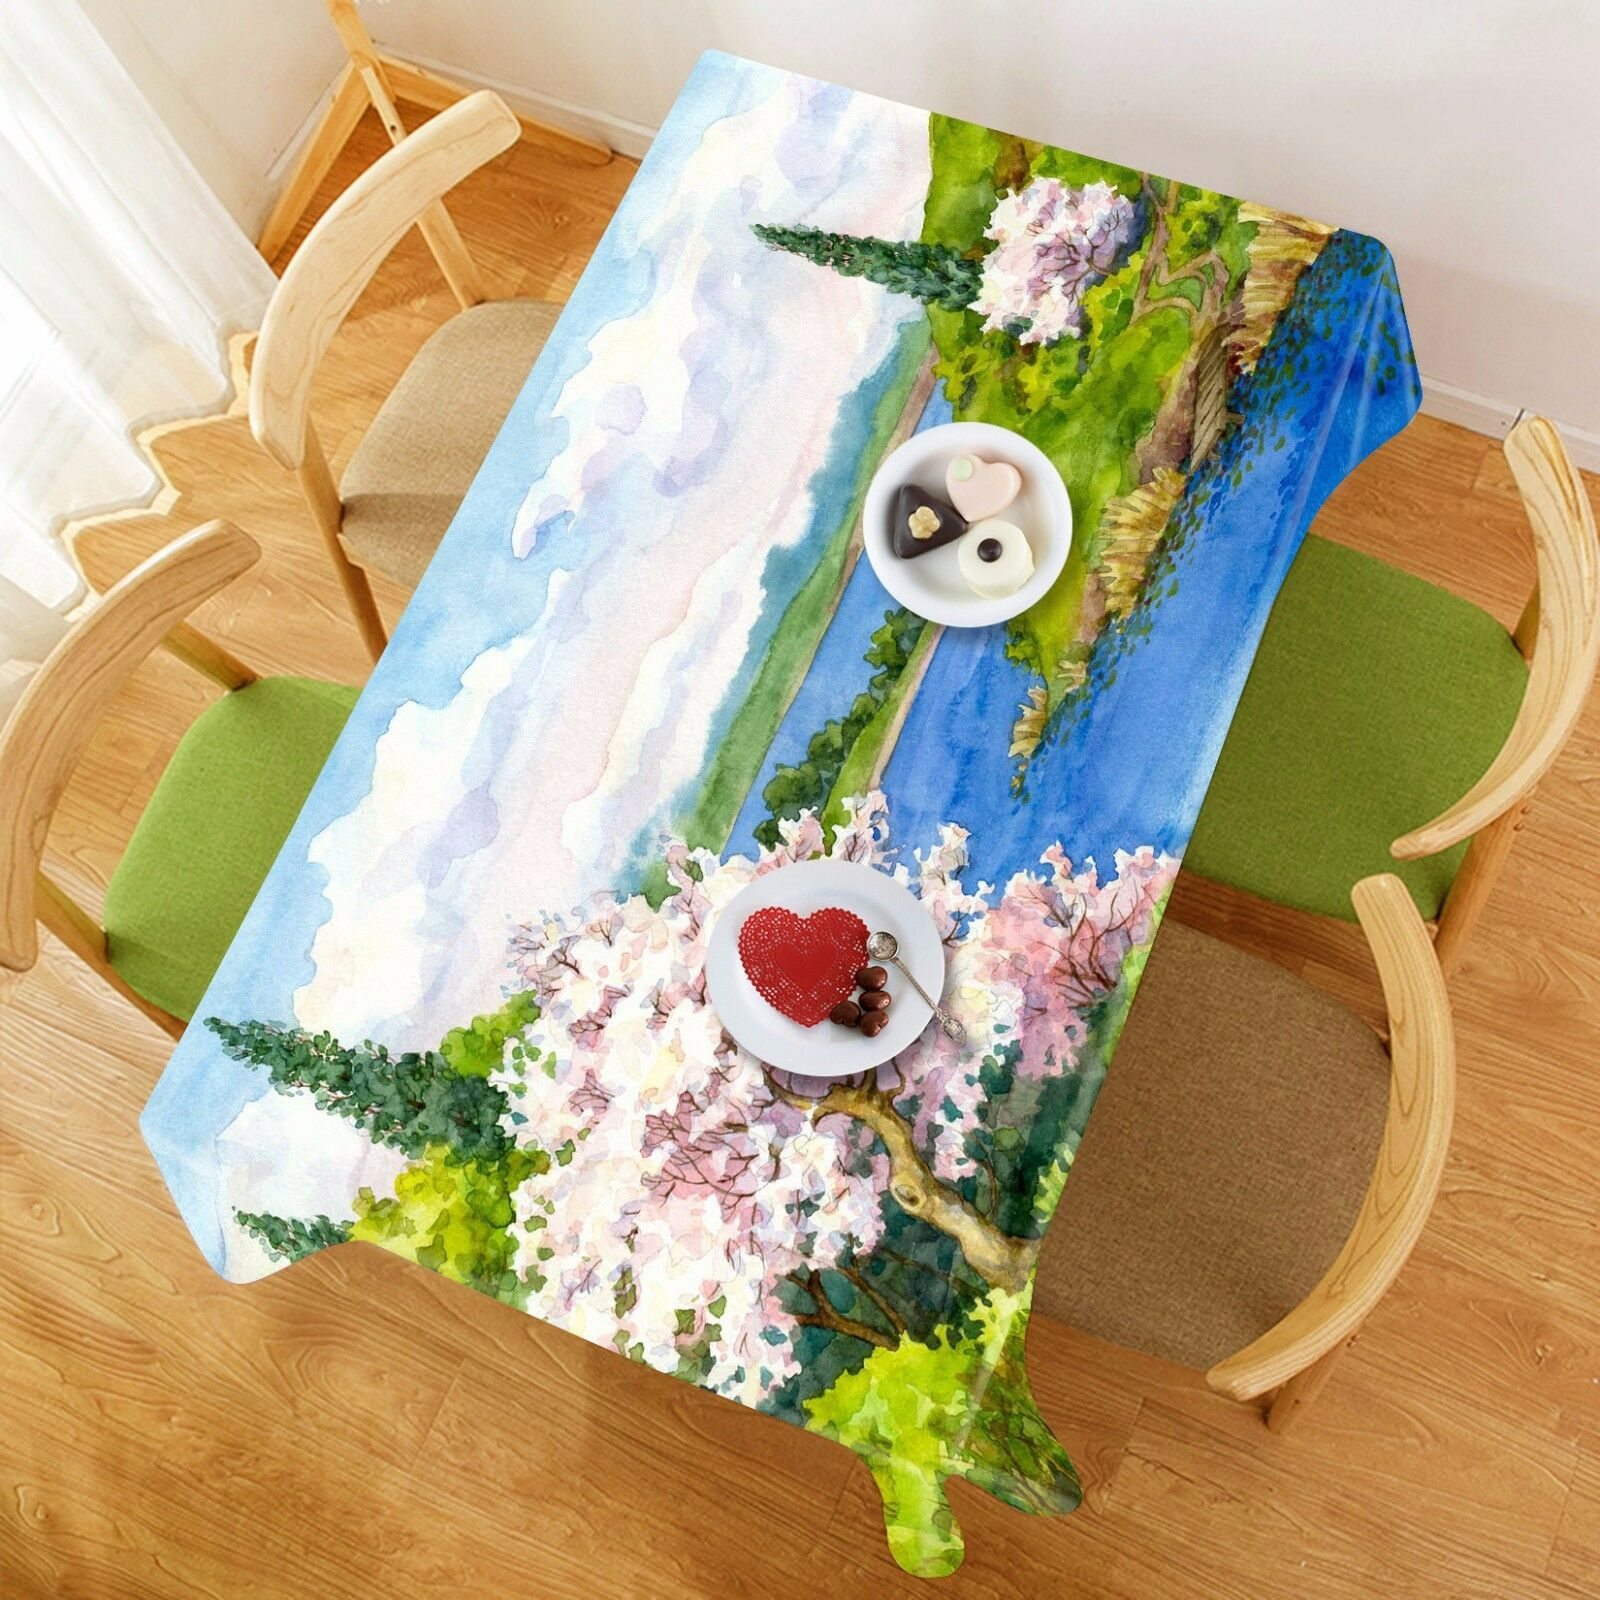 3D Flower Lake Tablecloth Table Cover Cloth Cloth Cloth Birthday Party AJ WALLPAPER UK Lemon 5f6de0